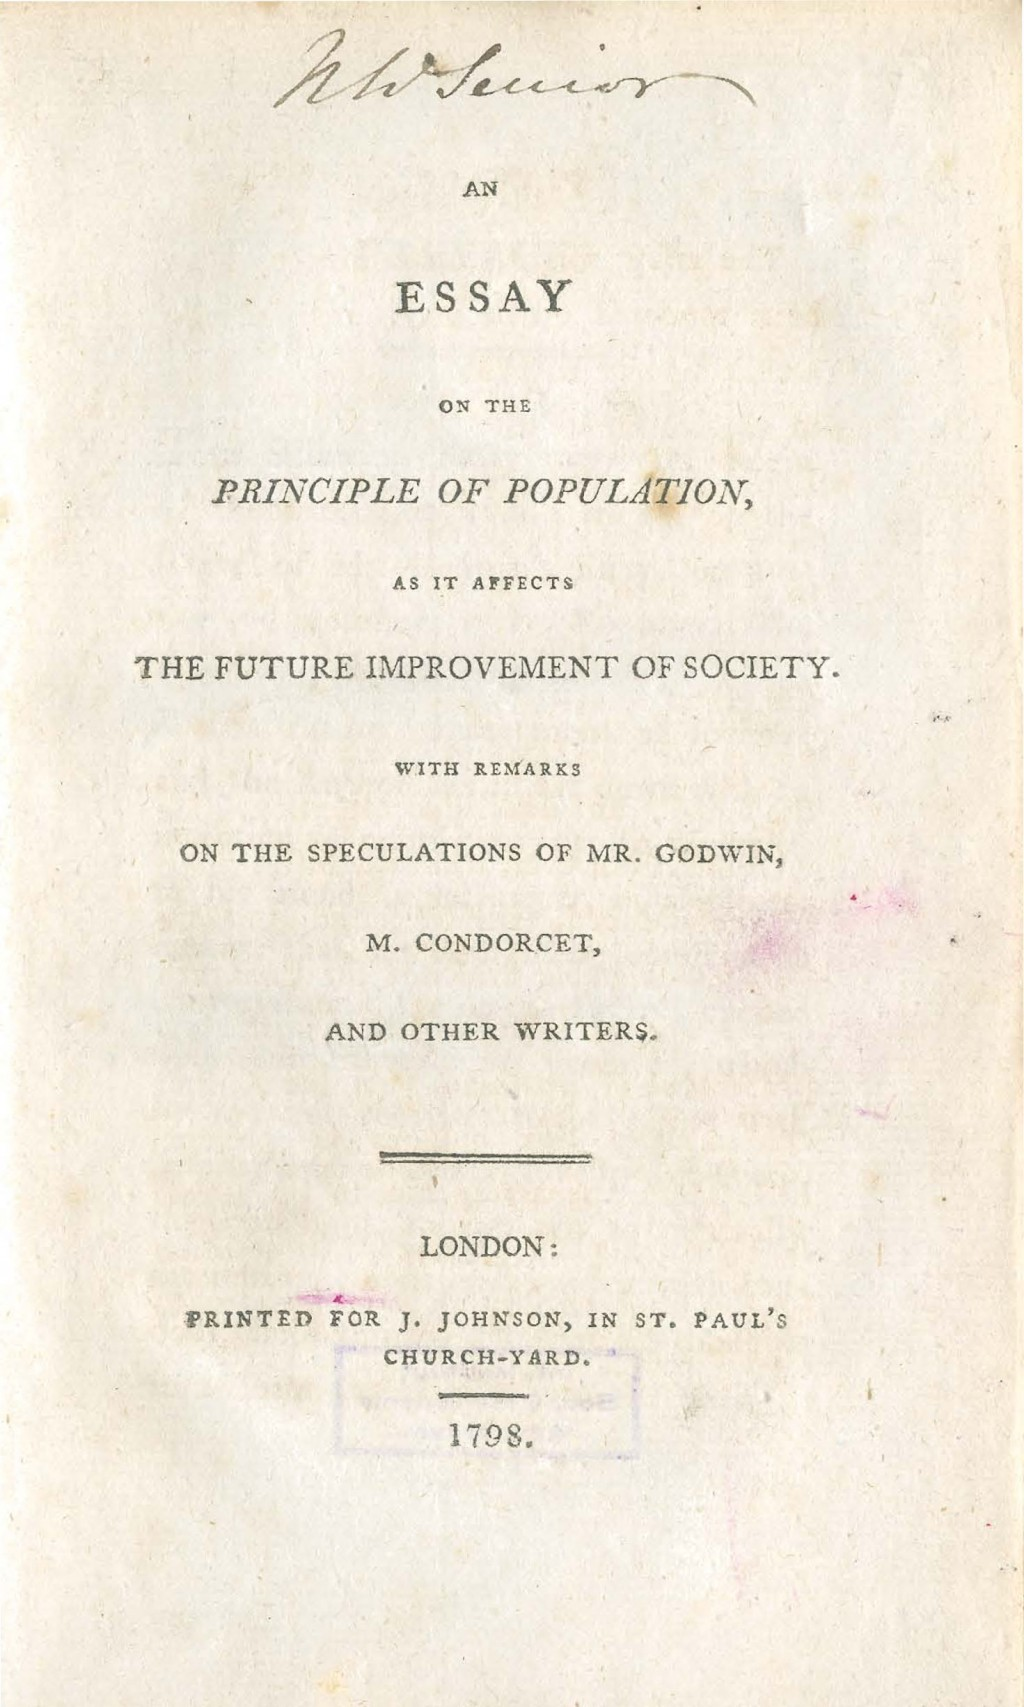 001 Essay On The Principle Of Population Singular Pdf By Thomas Malthus Main Idea Large